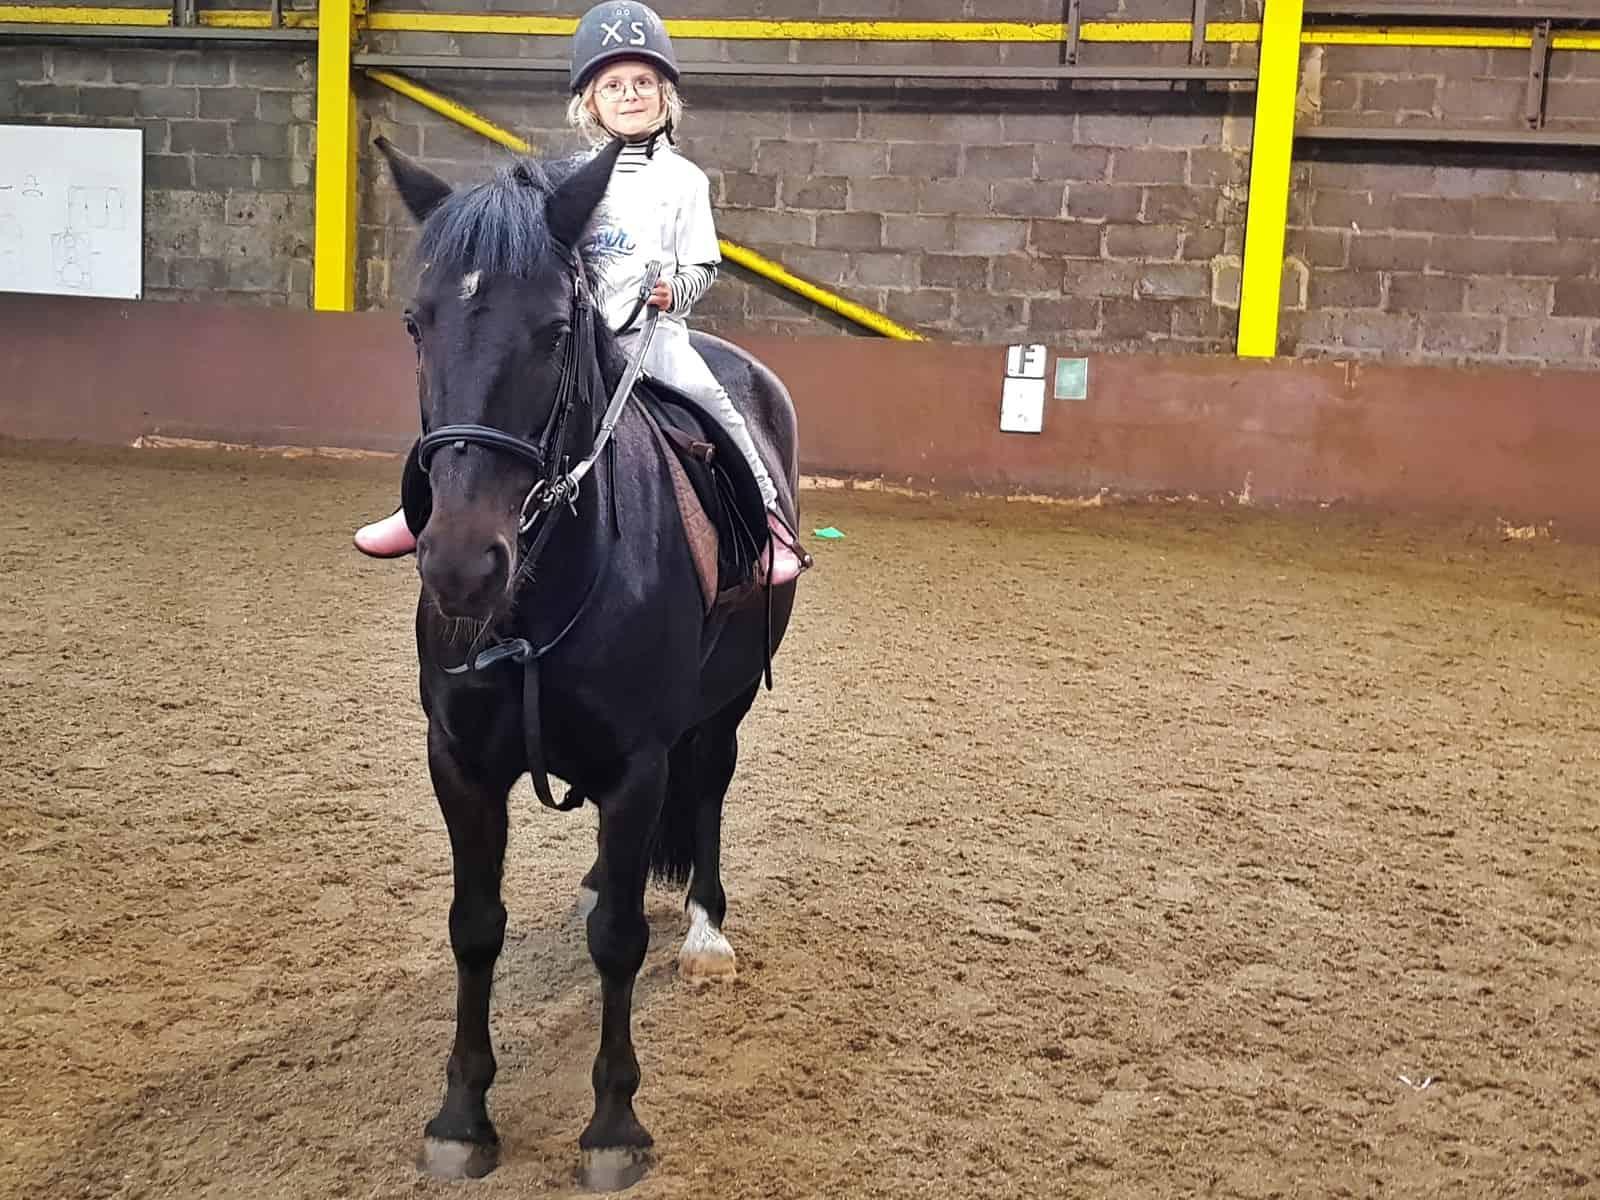 Spirit Riding Free Stable Sleepover girl on a black pony